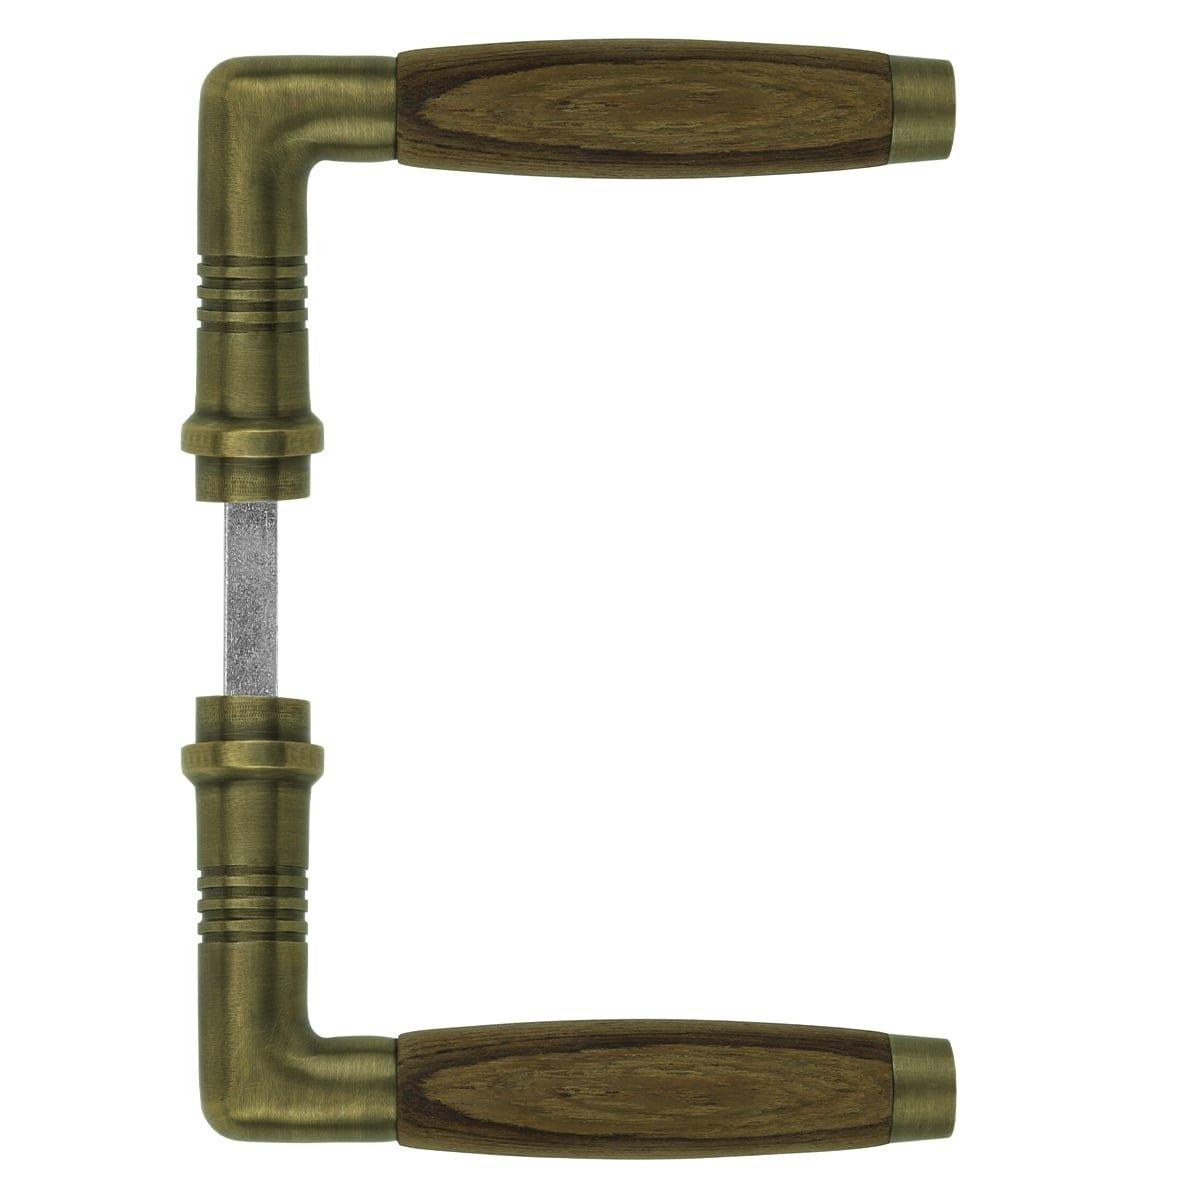 Türbeschläge Türhebels Türgriff bronze holzen griff Ahlen - 110 mm